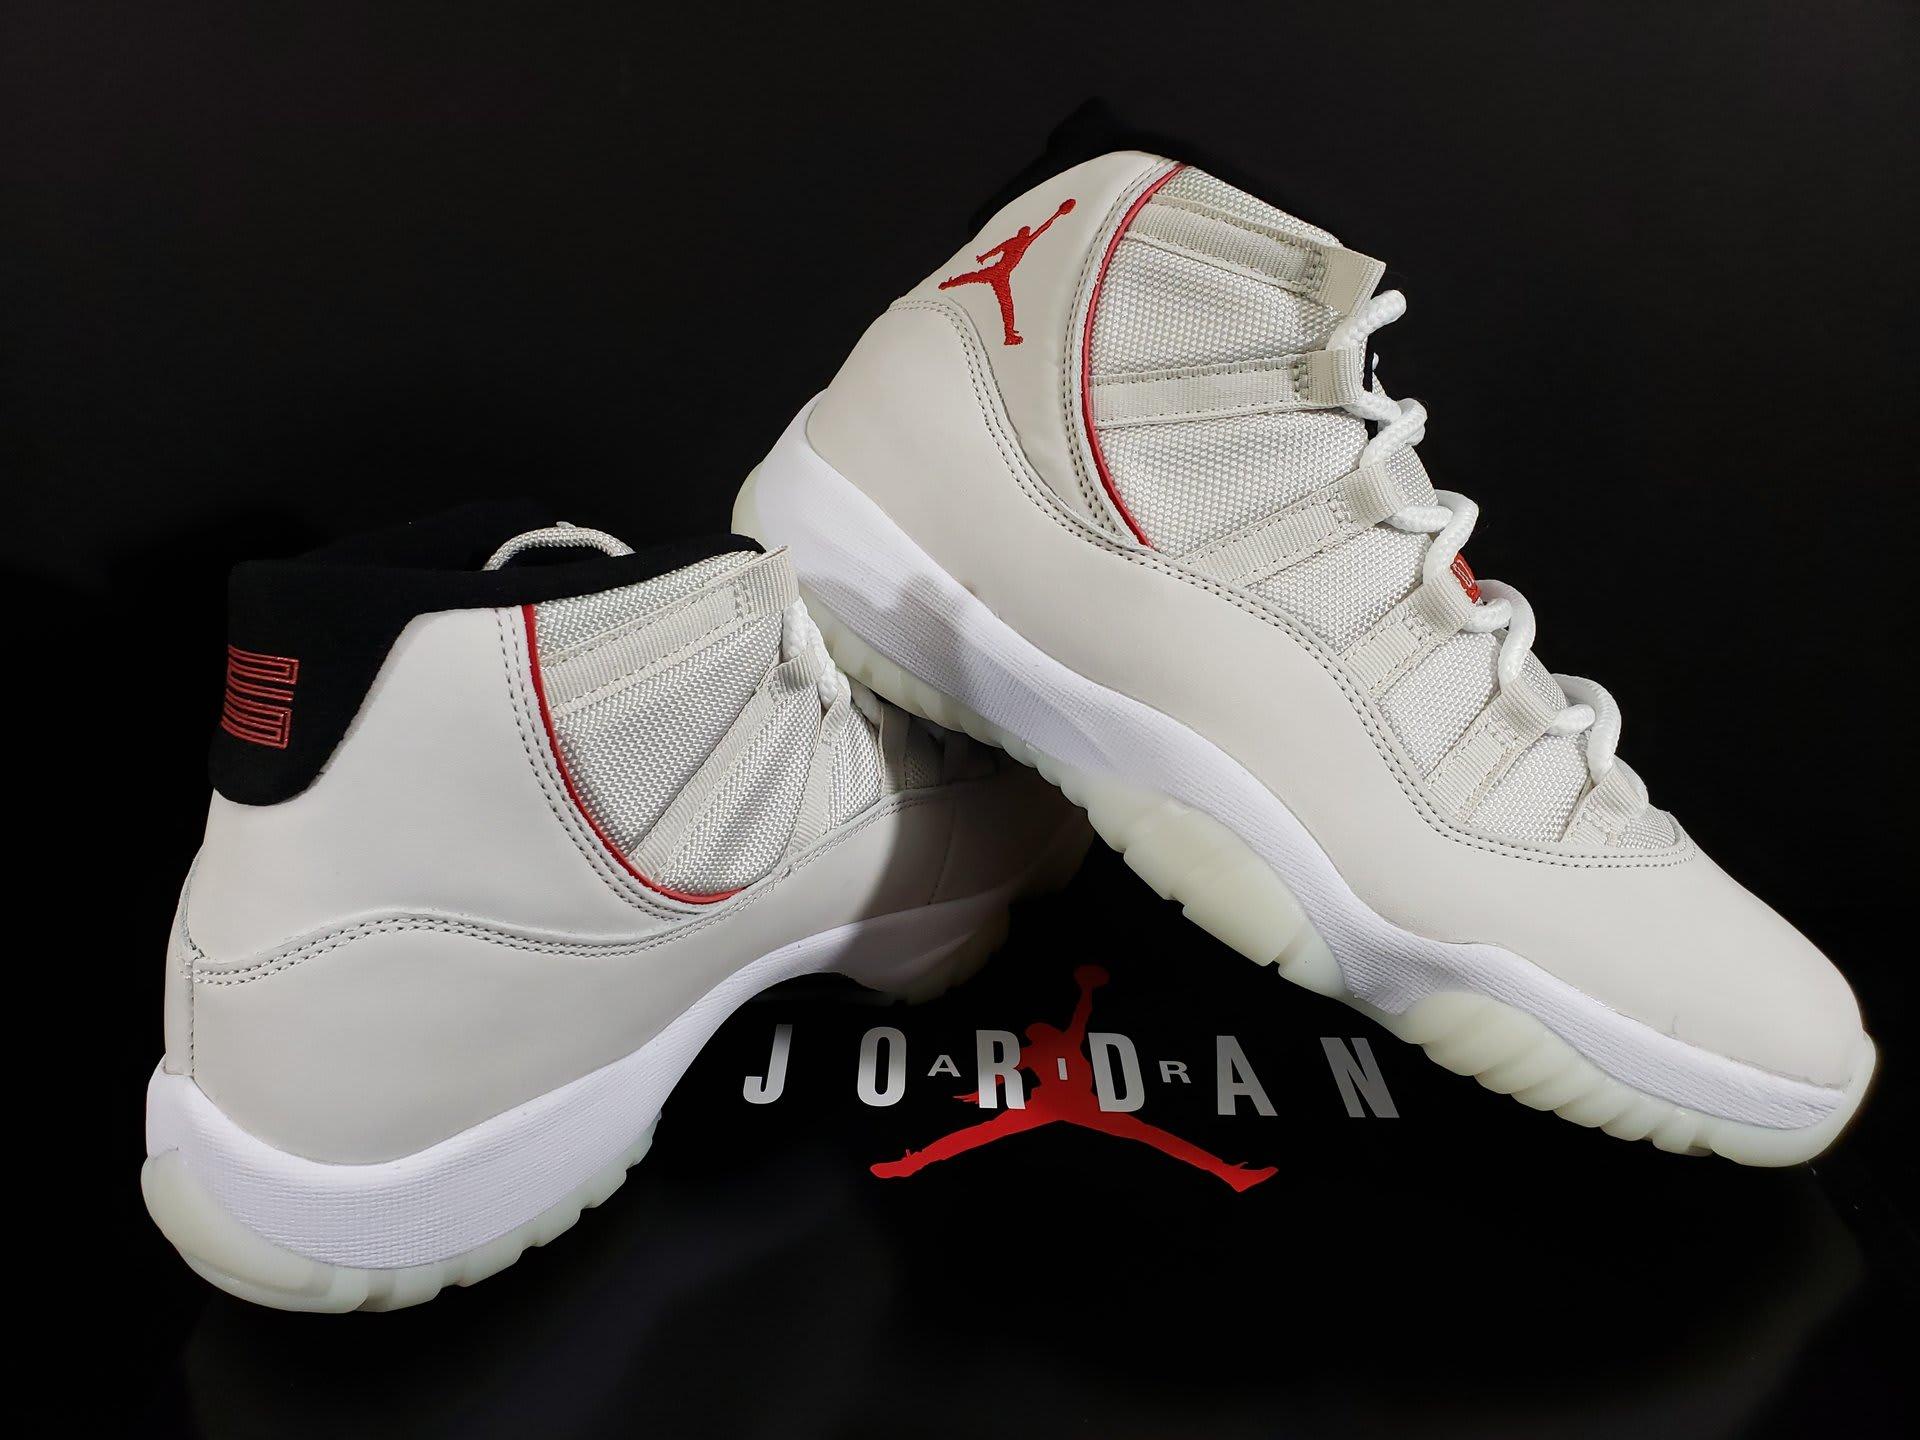 sports shoes 04dfb 0771a ... amazon image via fineline1721 air jordan 11 xi platinum tint release  date 378037 016 right 11588